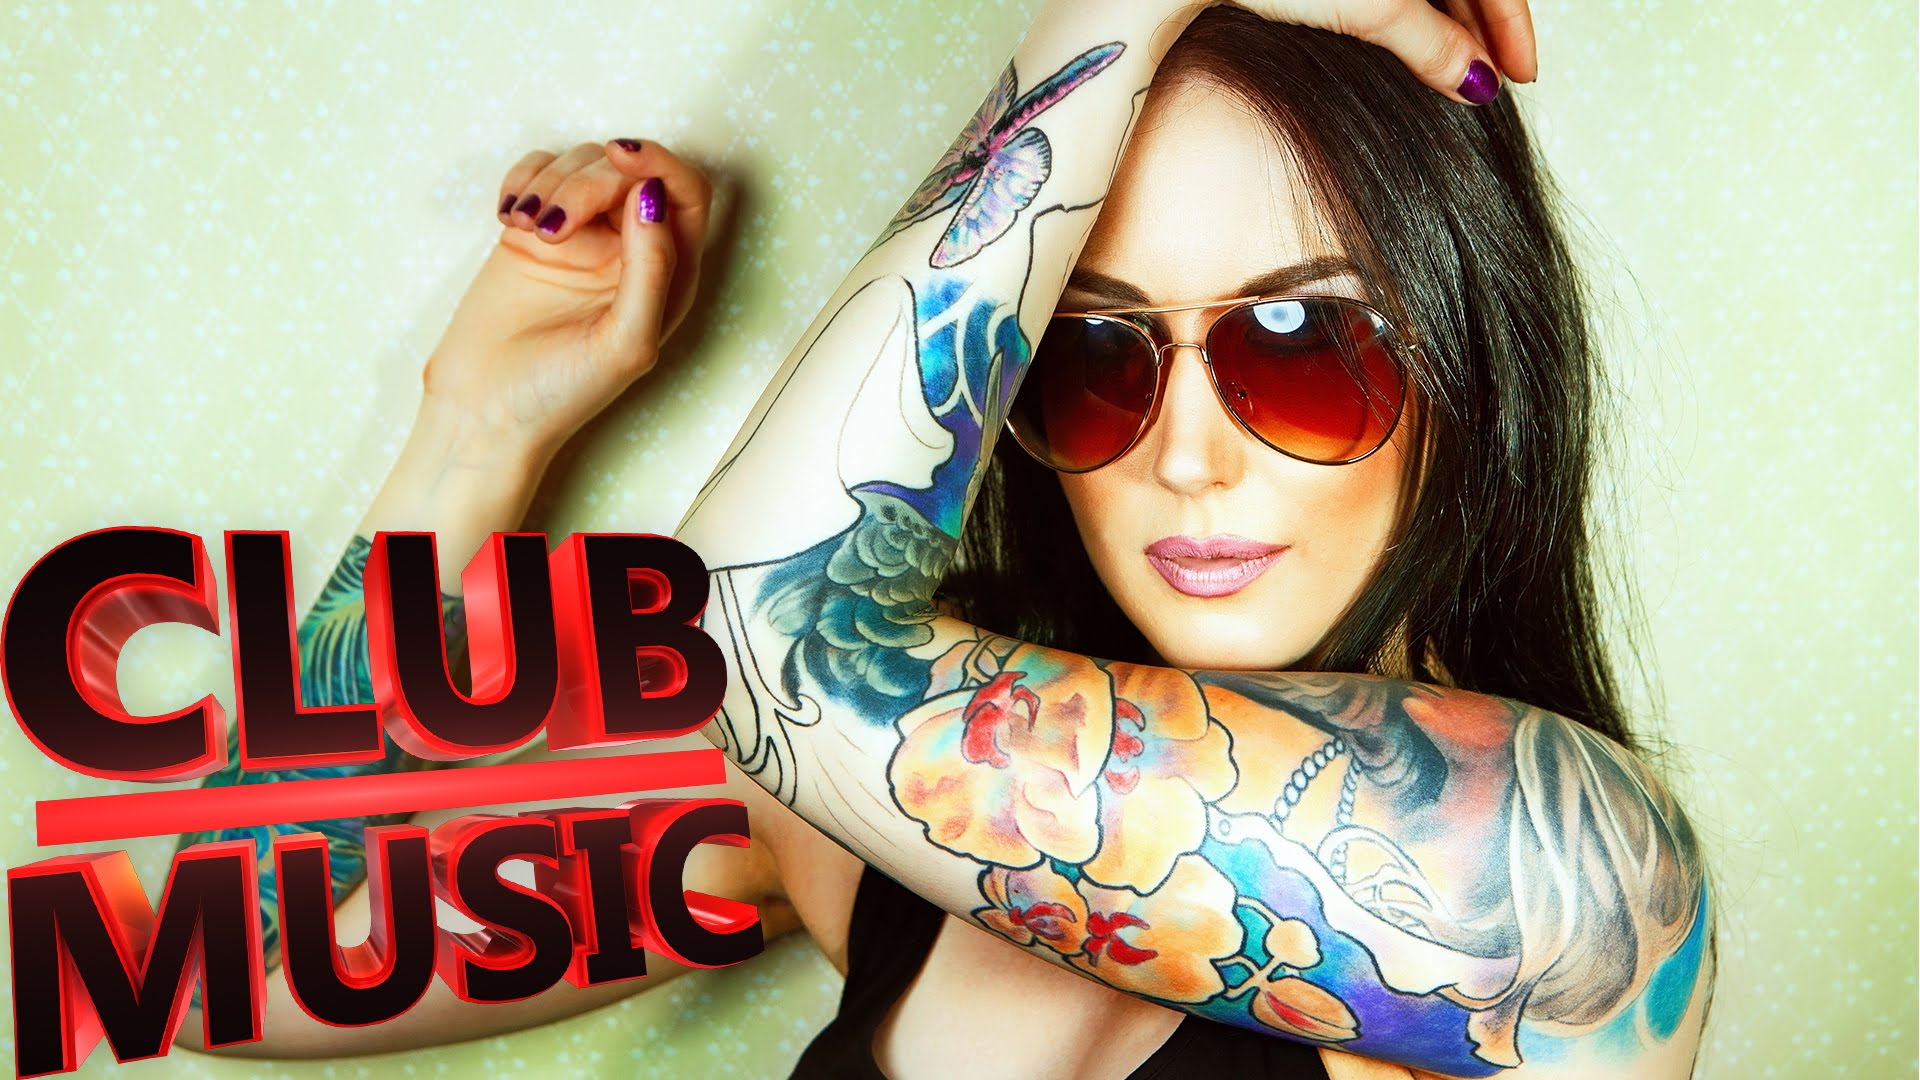 Hip Hop Urban Rnb Club Music MEGAMIX 2015 – CLUB MUSIC – Music Fury!